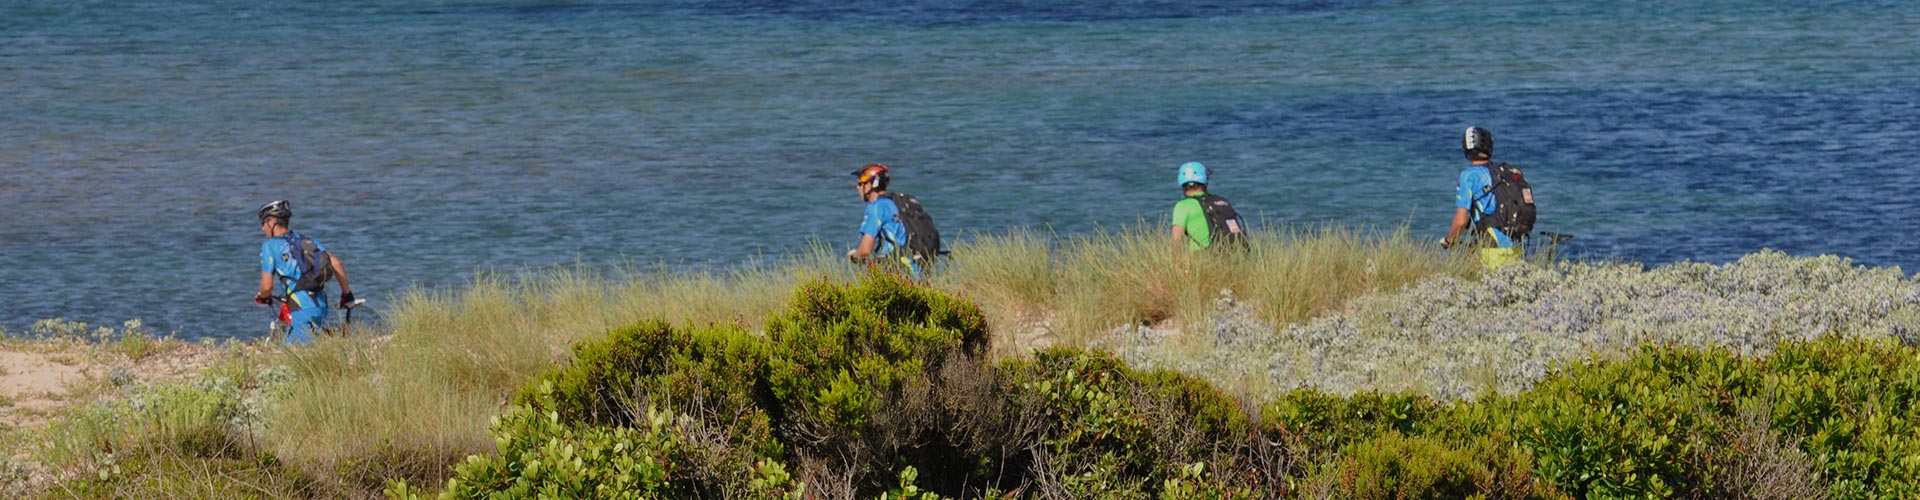 Camping le damier pianottoli caldarello en corse du sud for Camping avec piscine corse du sud